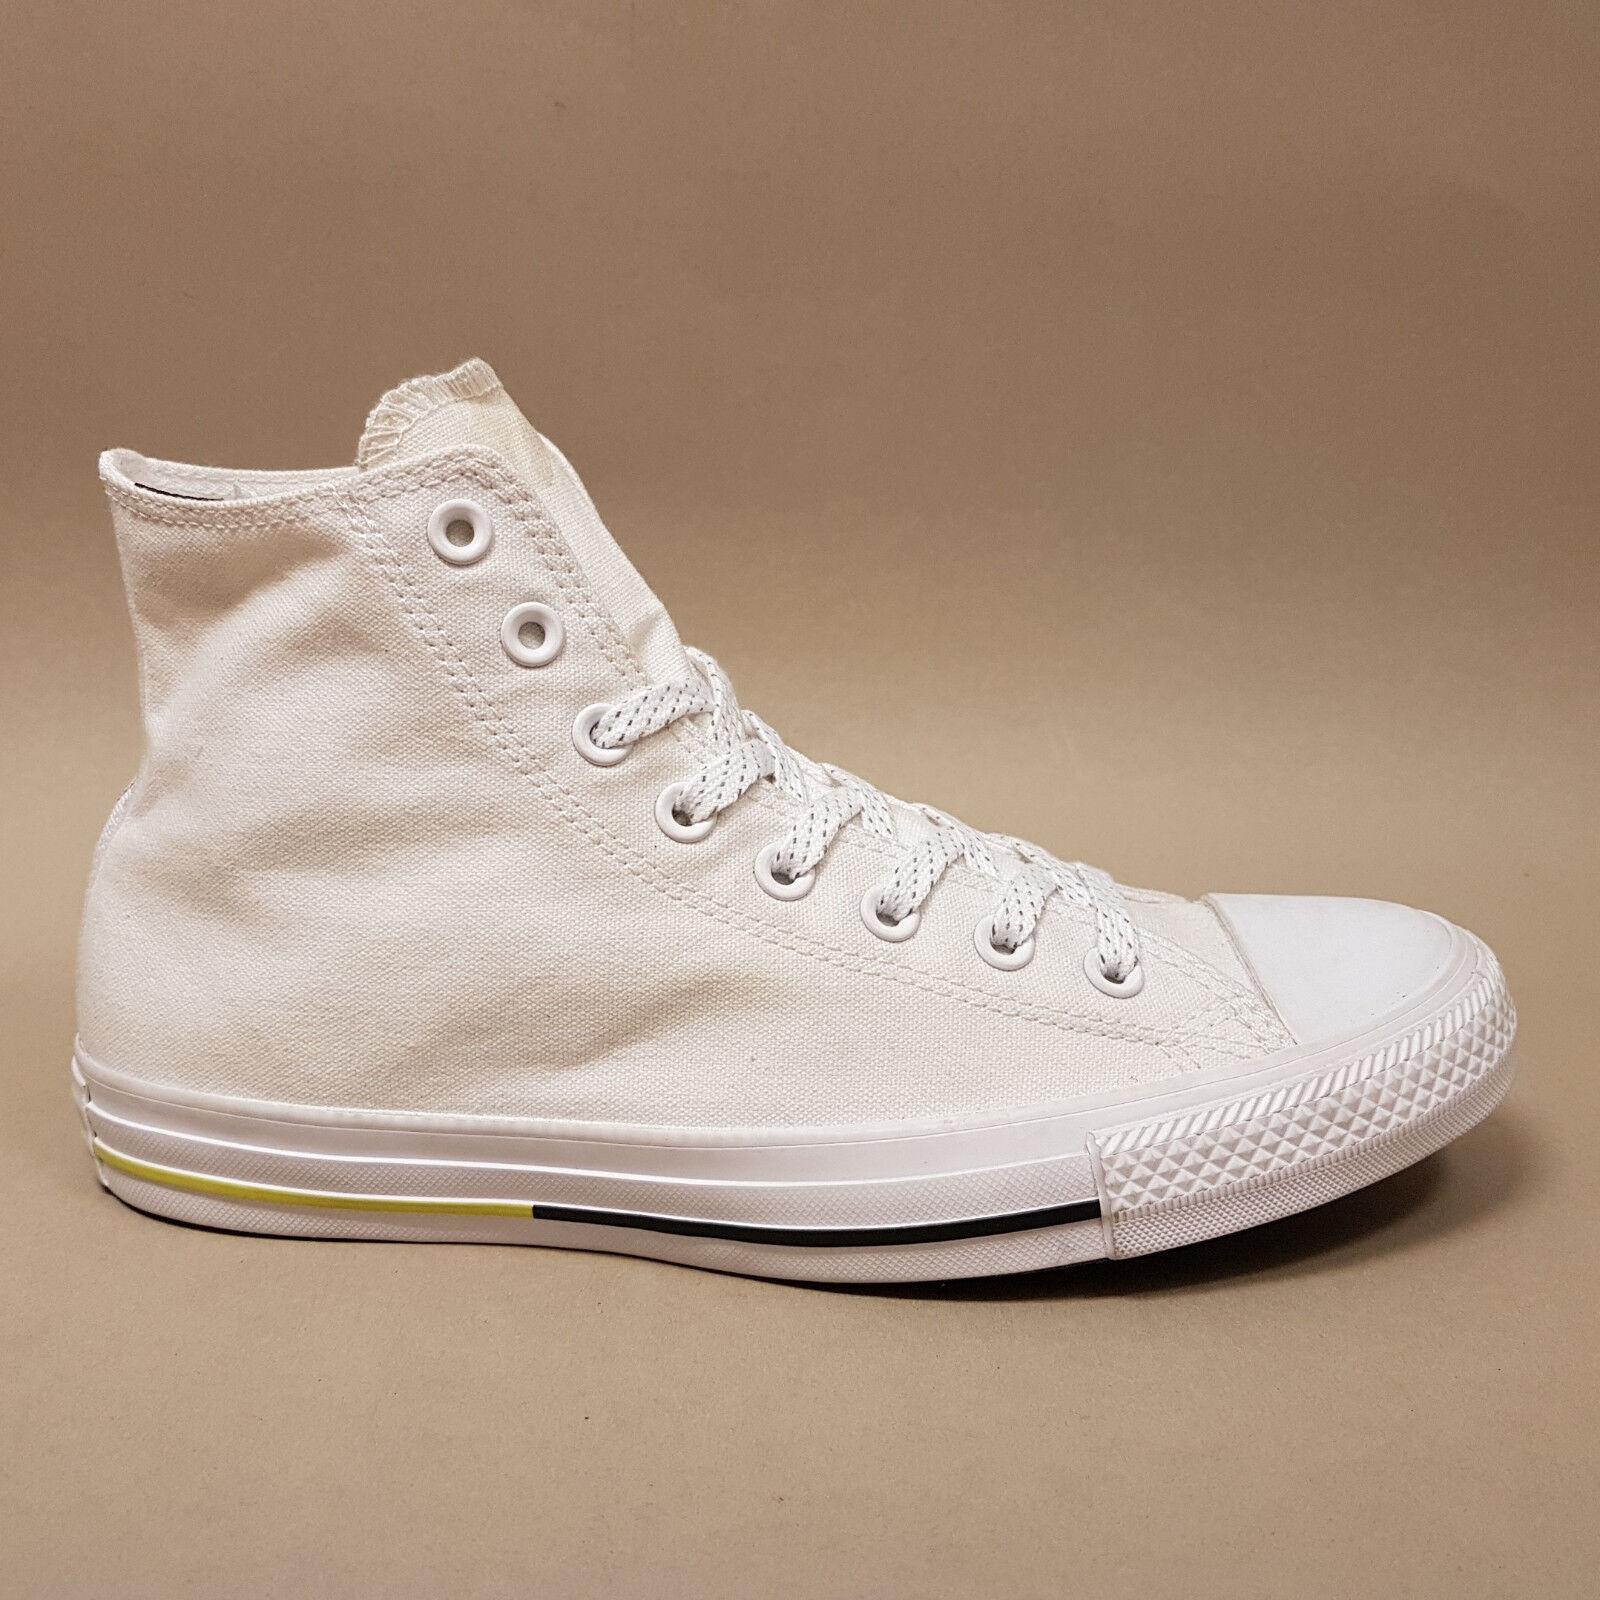 Converse All Star Chuck Hi White Counter Climate 153791C Sneaker weiß Gr. 42